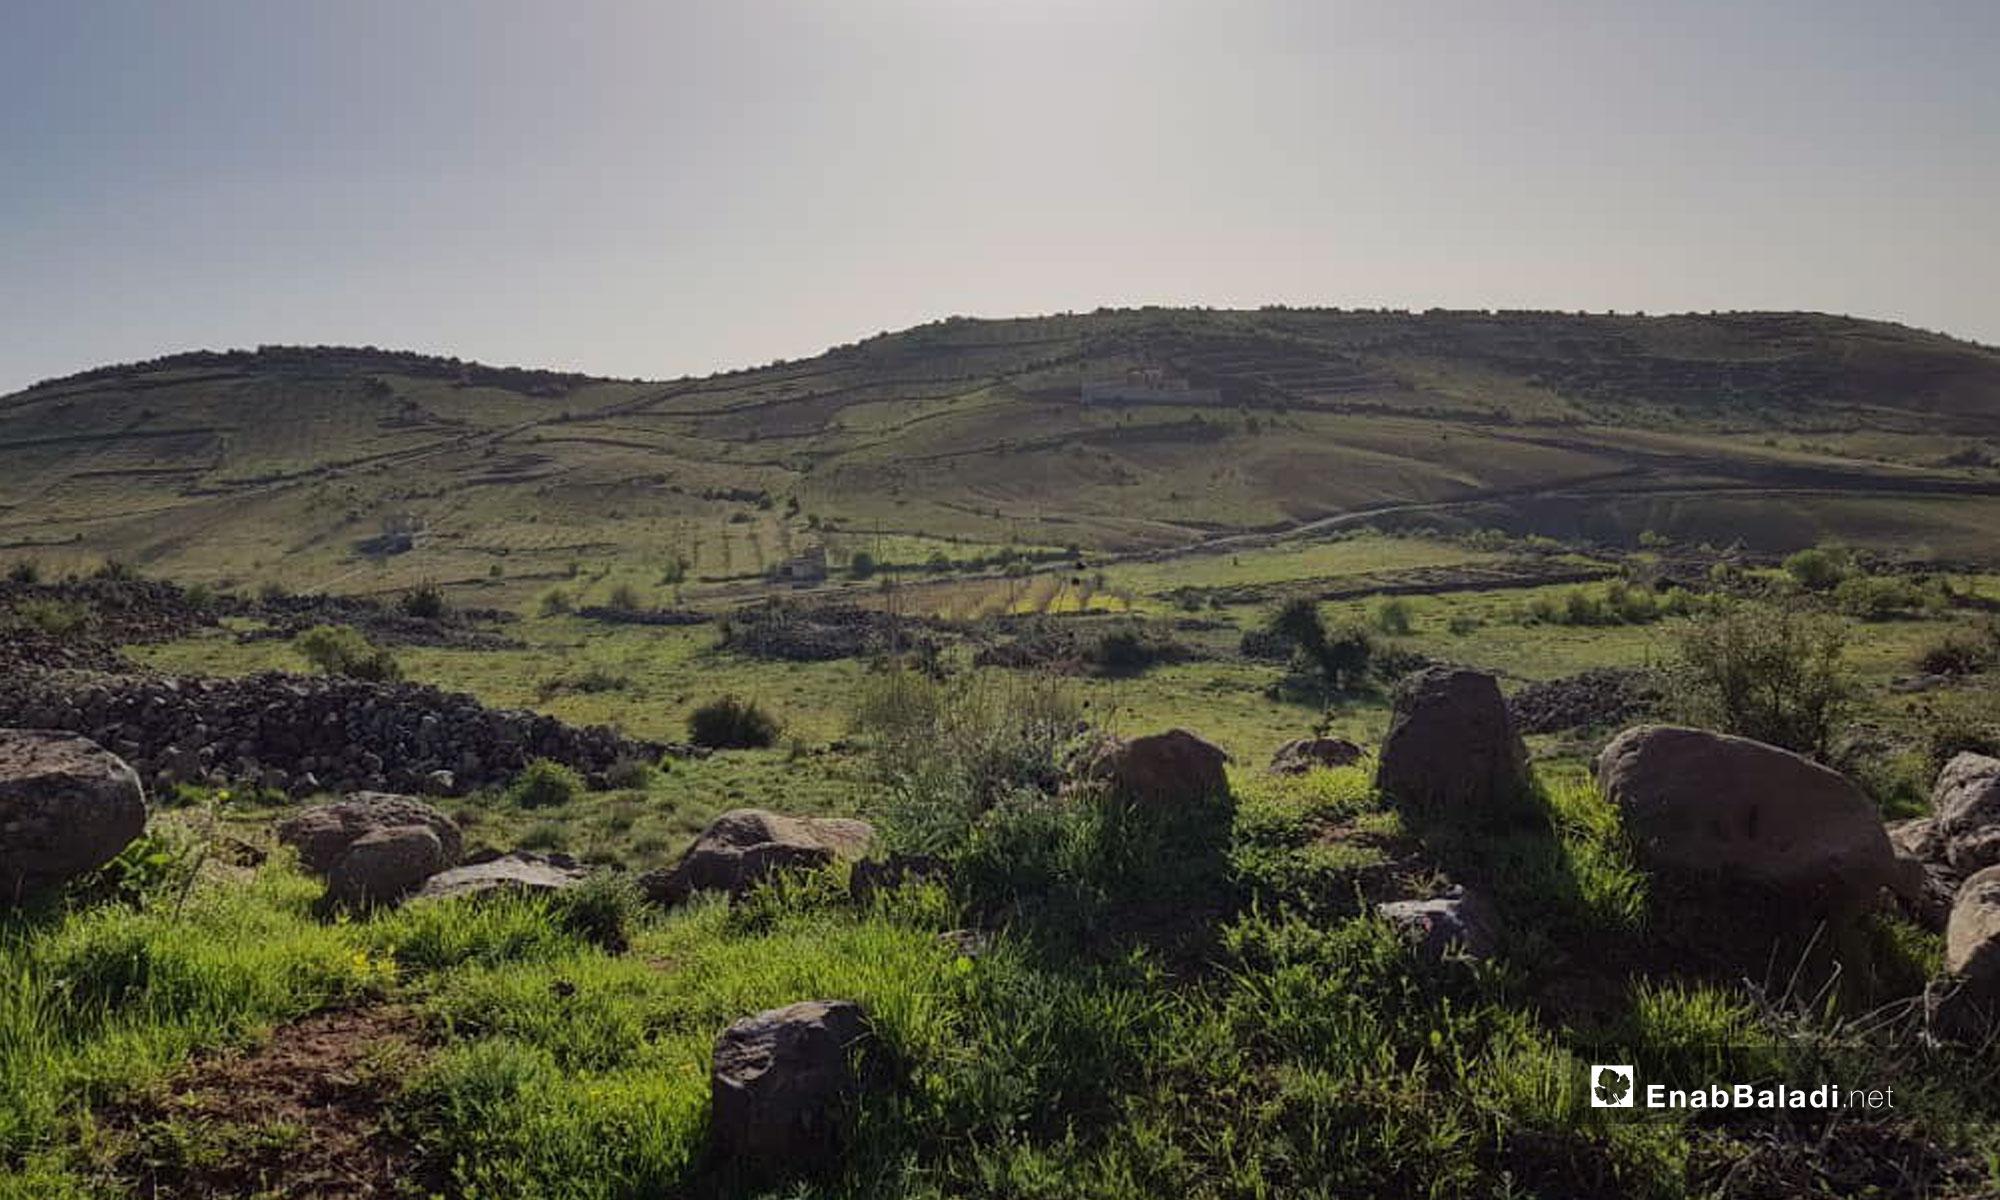 Spring in the city of Sweida - April 9, 2019 (Enab Baladi)